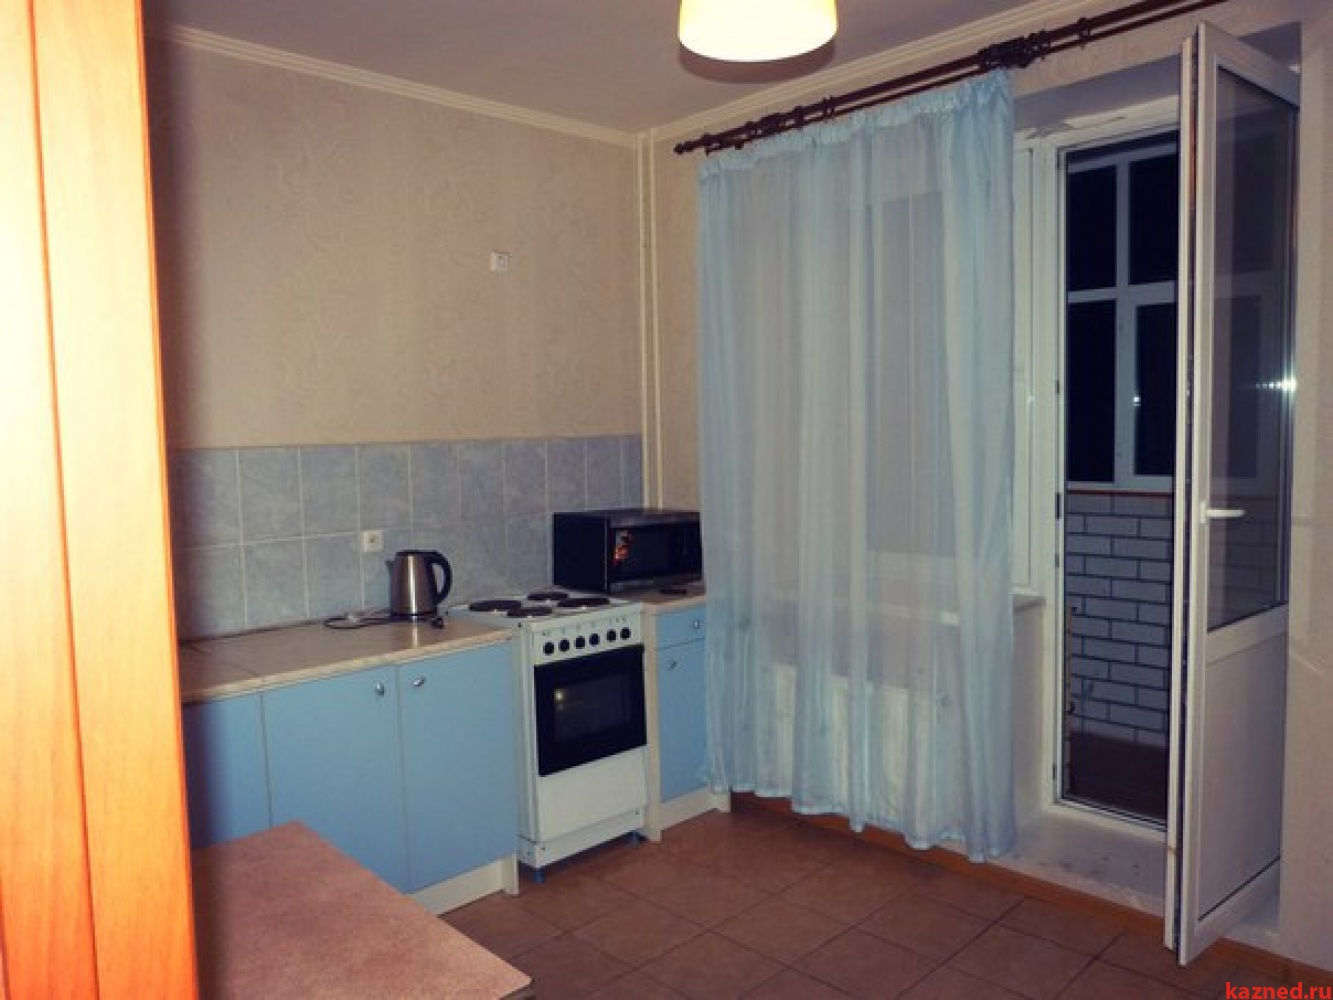 Продажа 1-к квартиры Маршала Чуйкова 62, 39 м² (миниатюра №1)